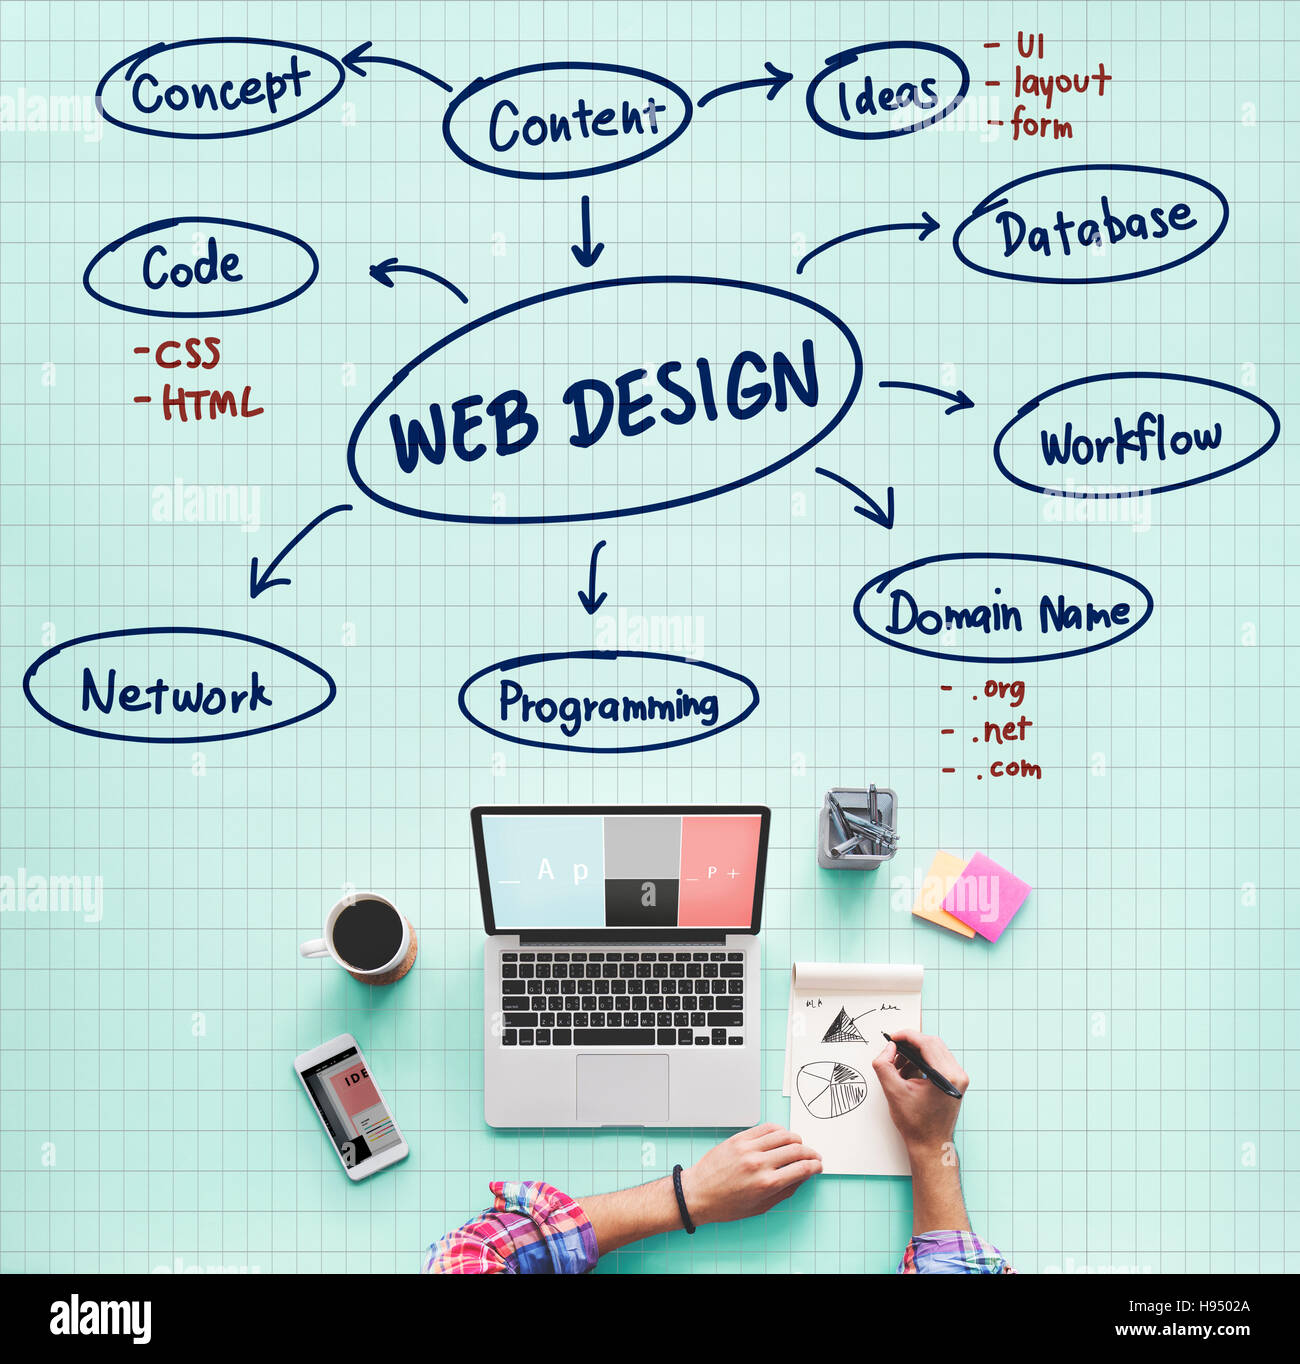 Web Design Ideas Creativity Programming Stock Photos & Web Design ...